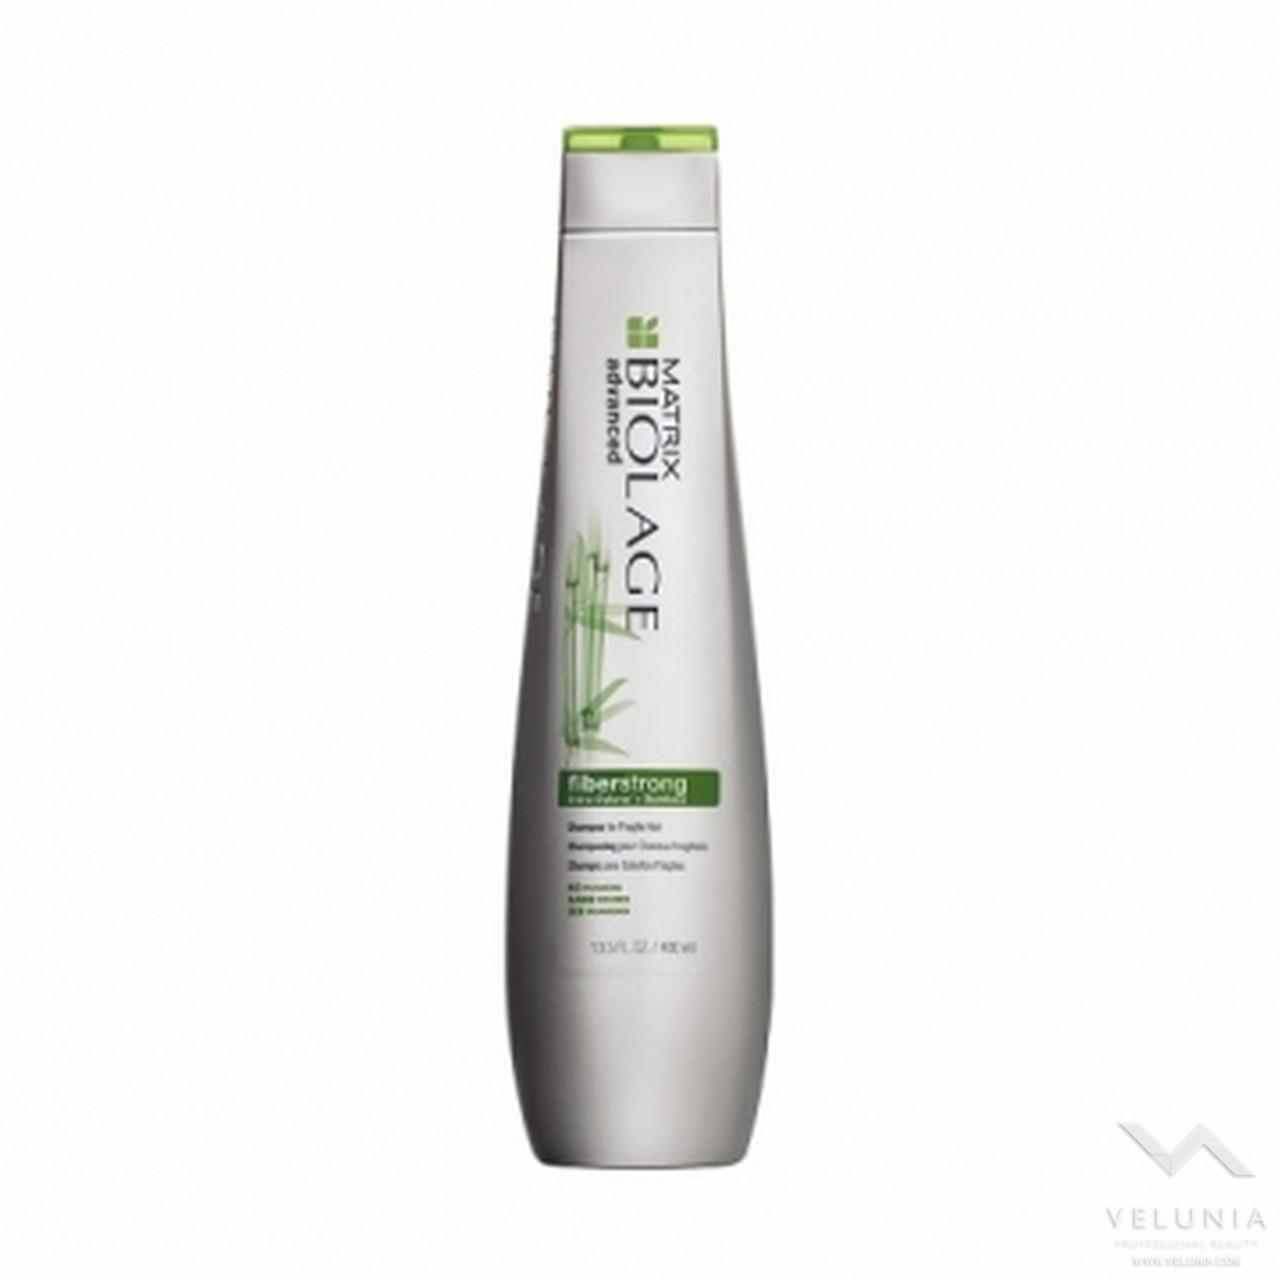 Biolage Fiberstrong shampoo 400 ML 1